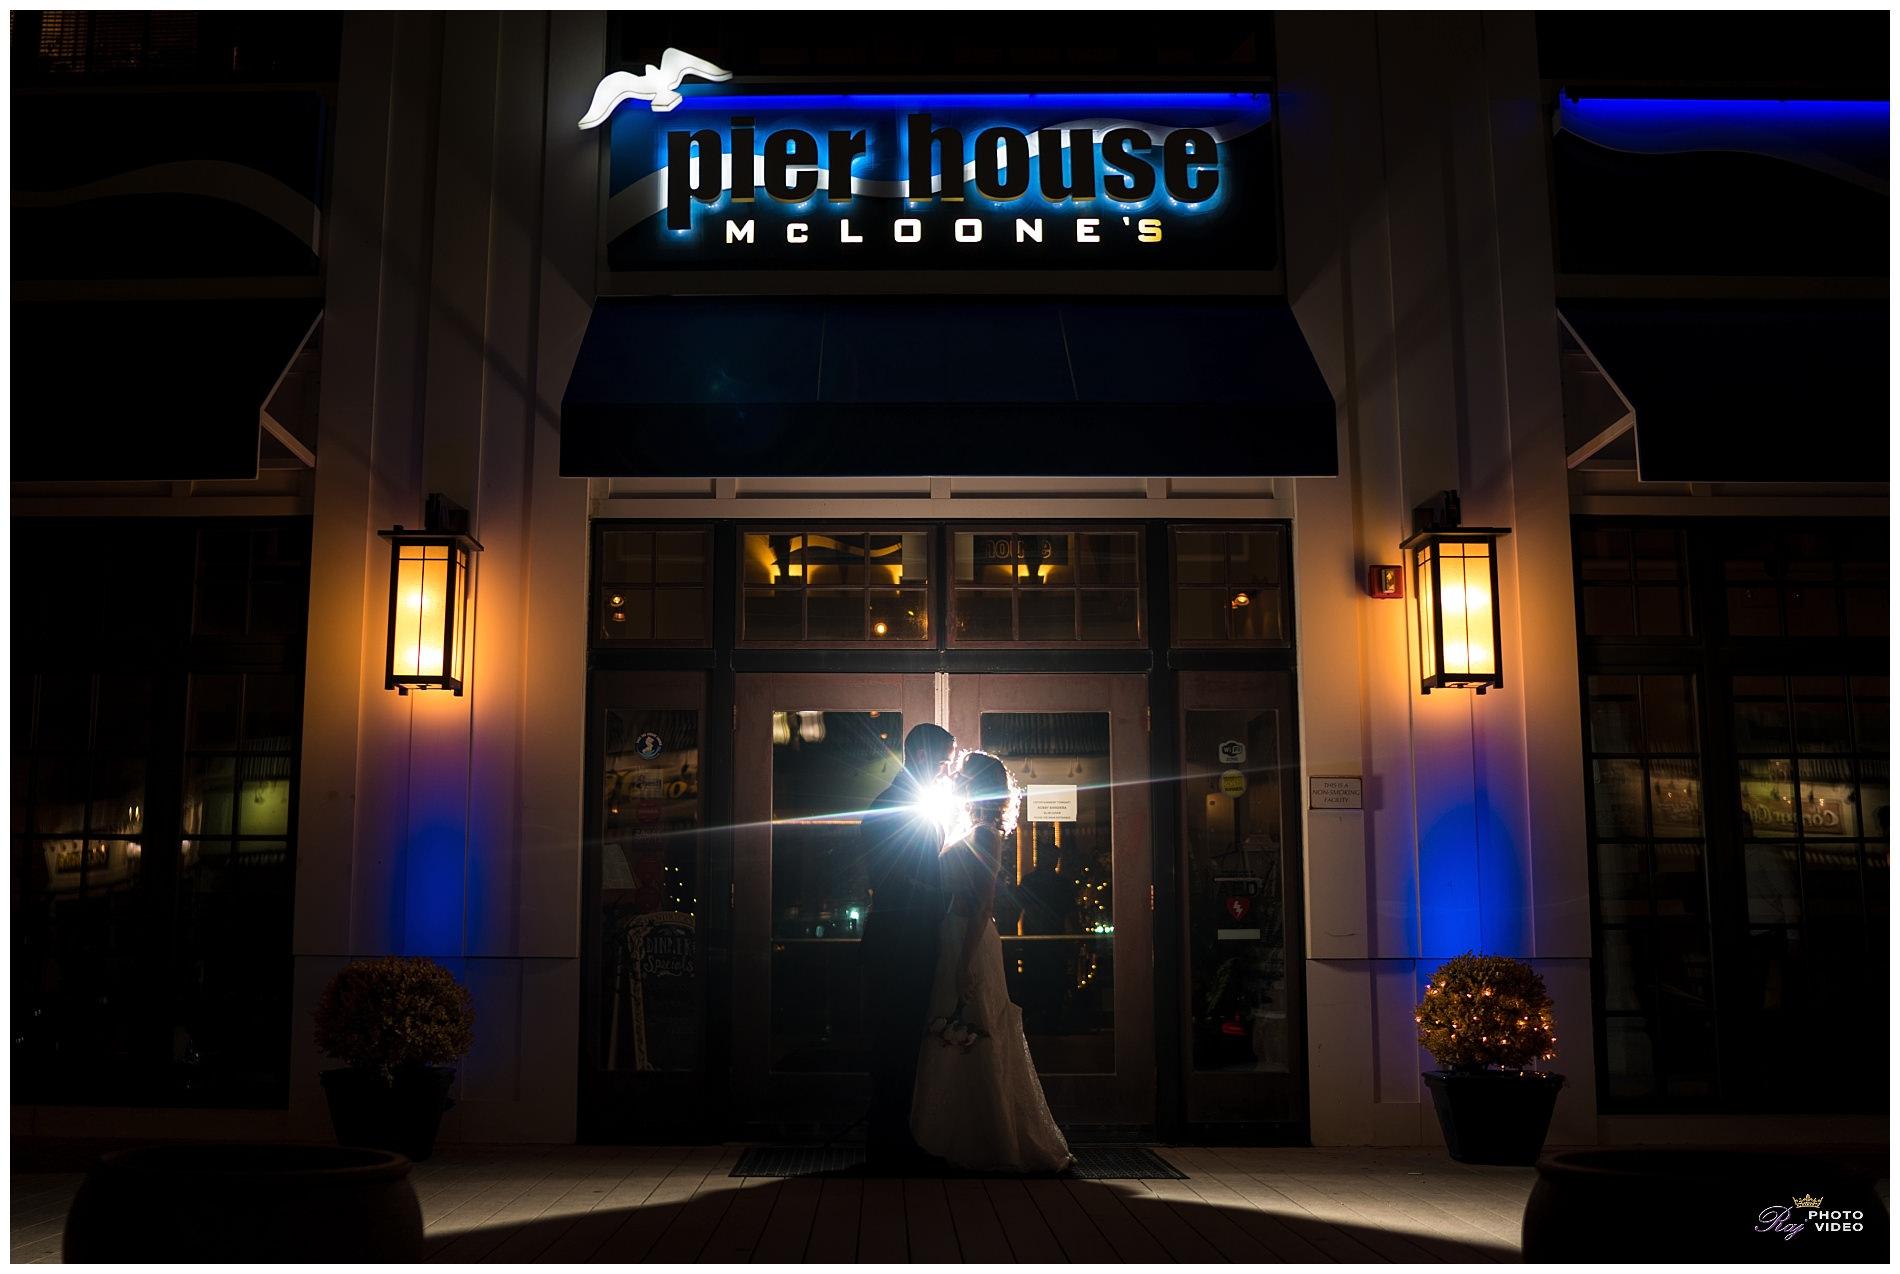 McLoones-Pier-House-Long-Branch-NJ-Wedding-Geraldine-Daniel-16.jpg